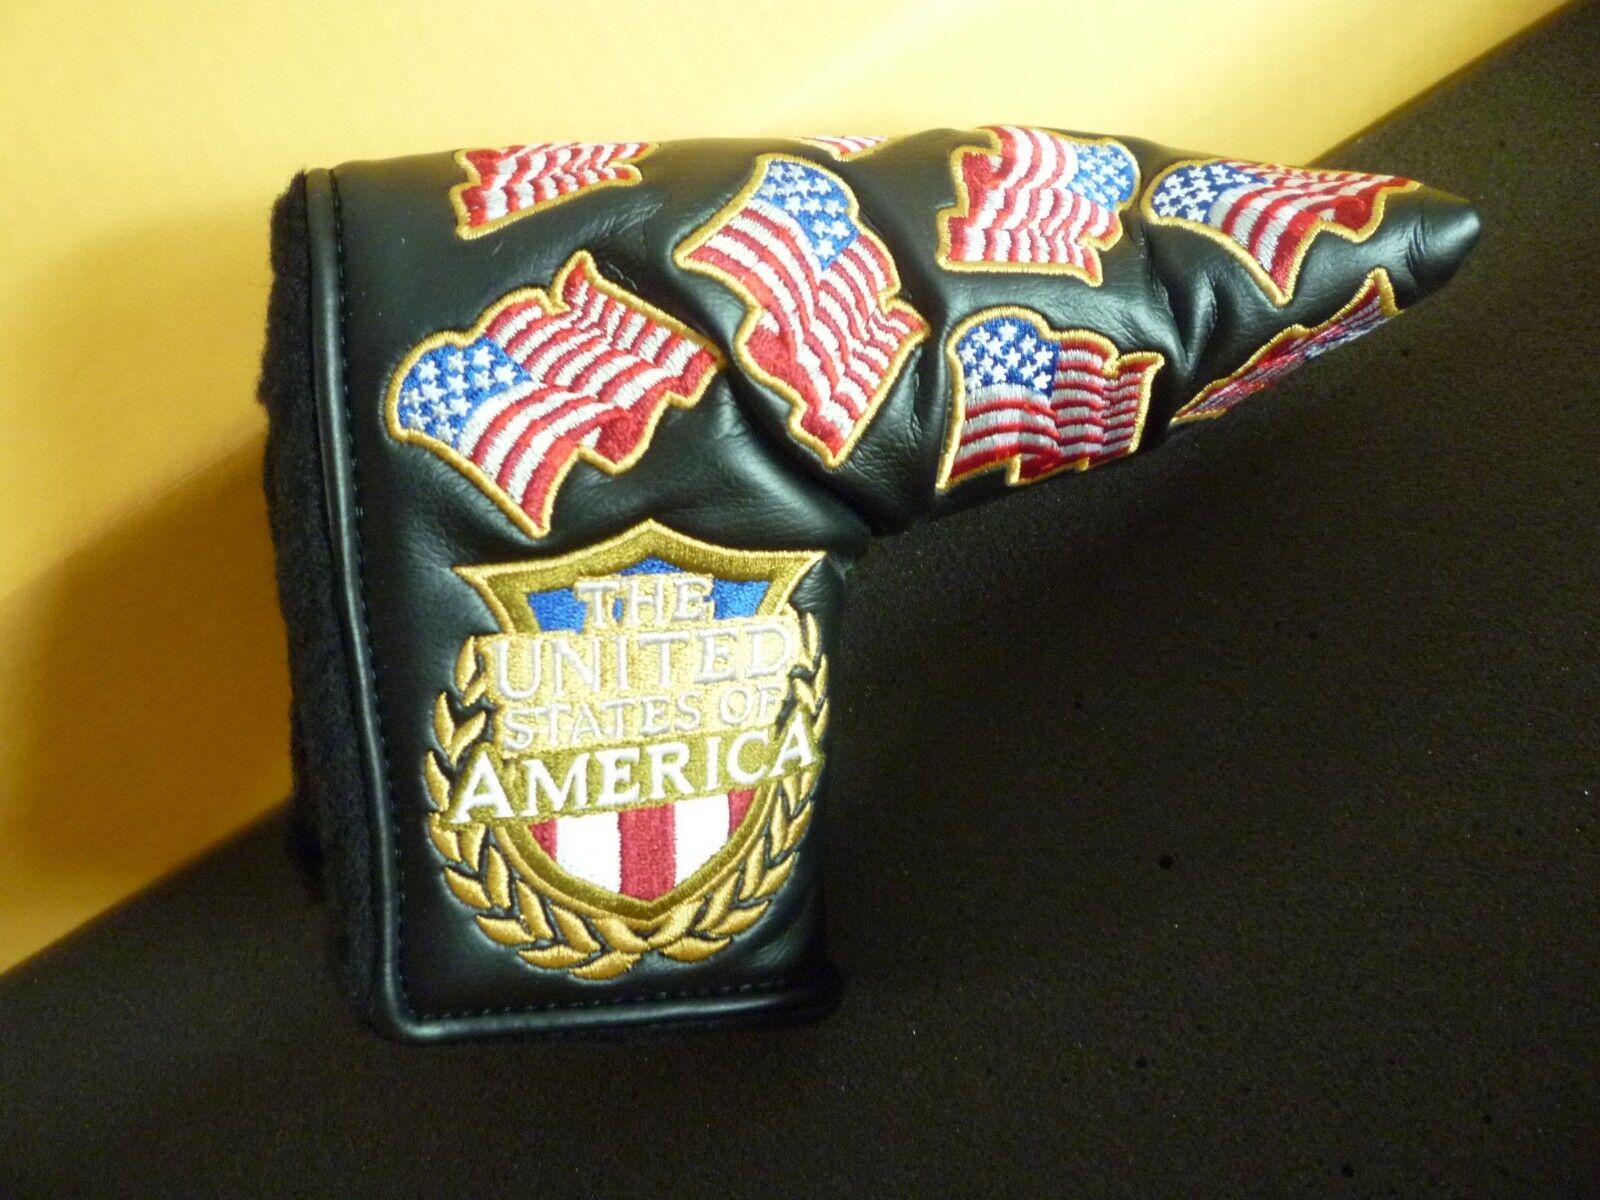 Scotty Cameron Titleist EE. UU. Flag Putter Cubierta Nuevo Us Open Dustin Johnson Oakmont